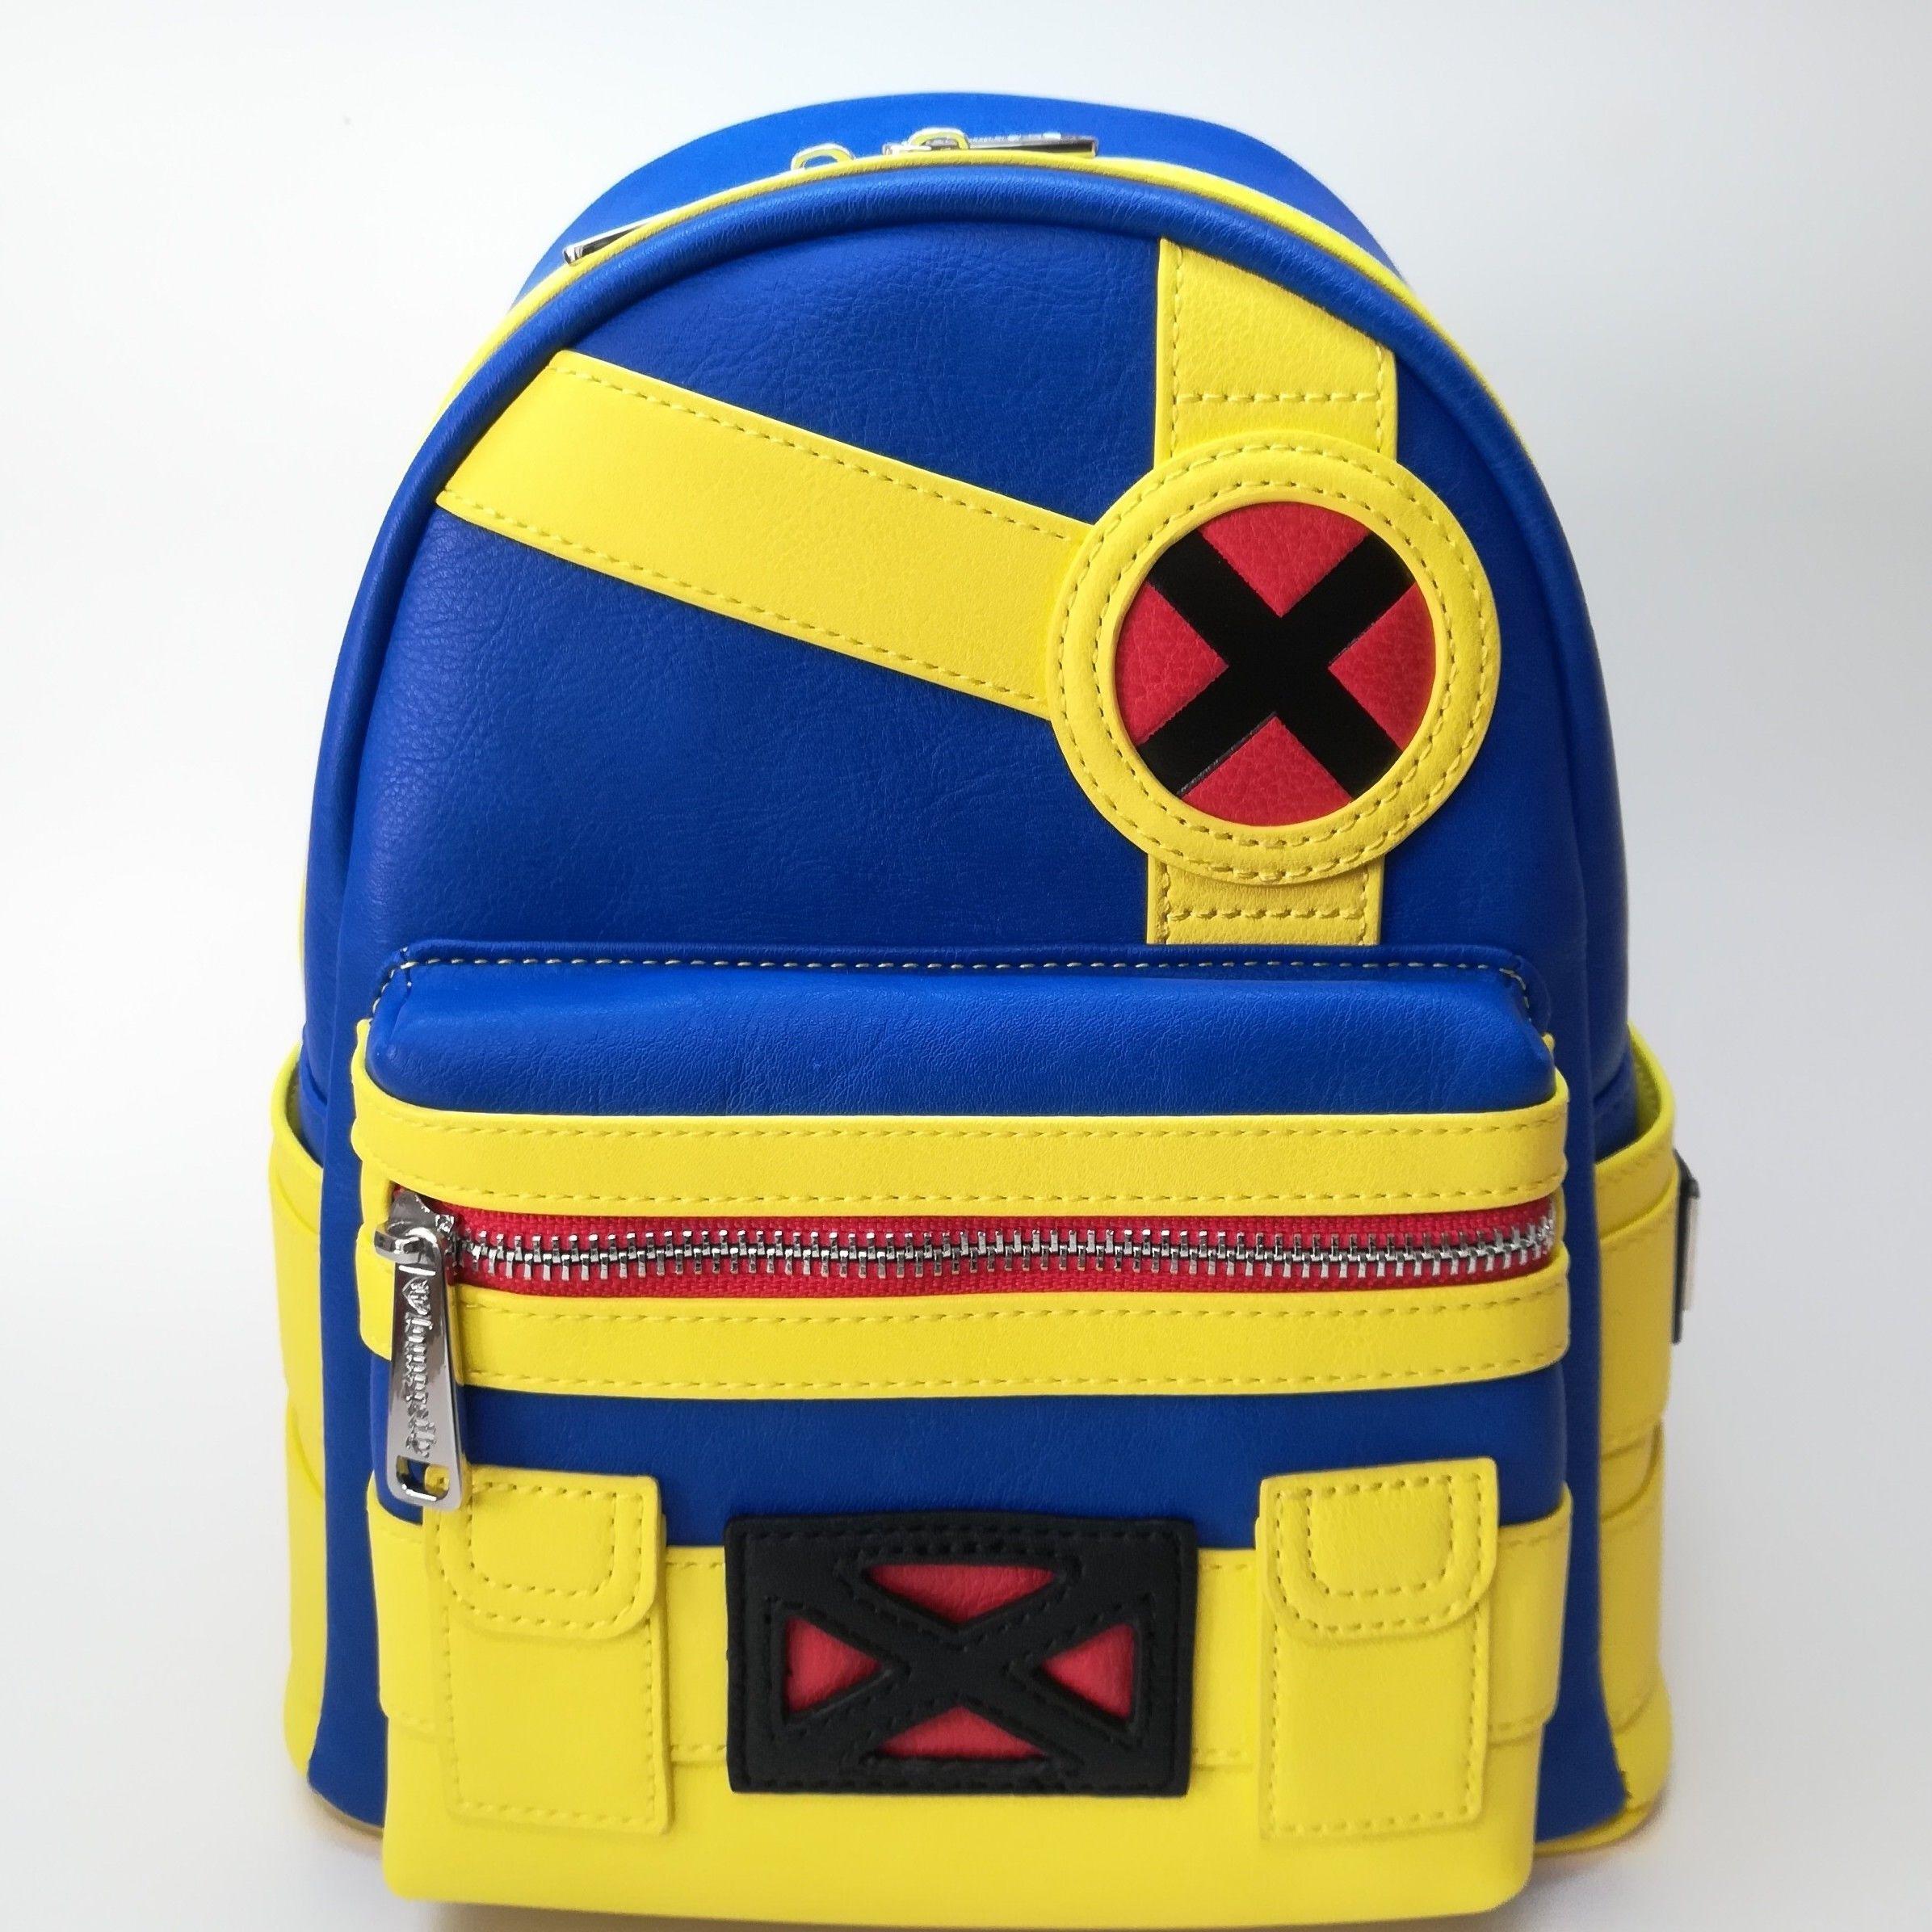 Mini Backpack Disney Marvel Thor Ragnarok Avengers Loki Loungefly